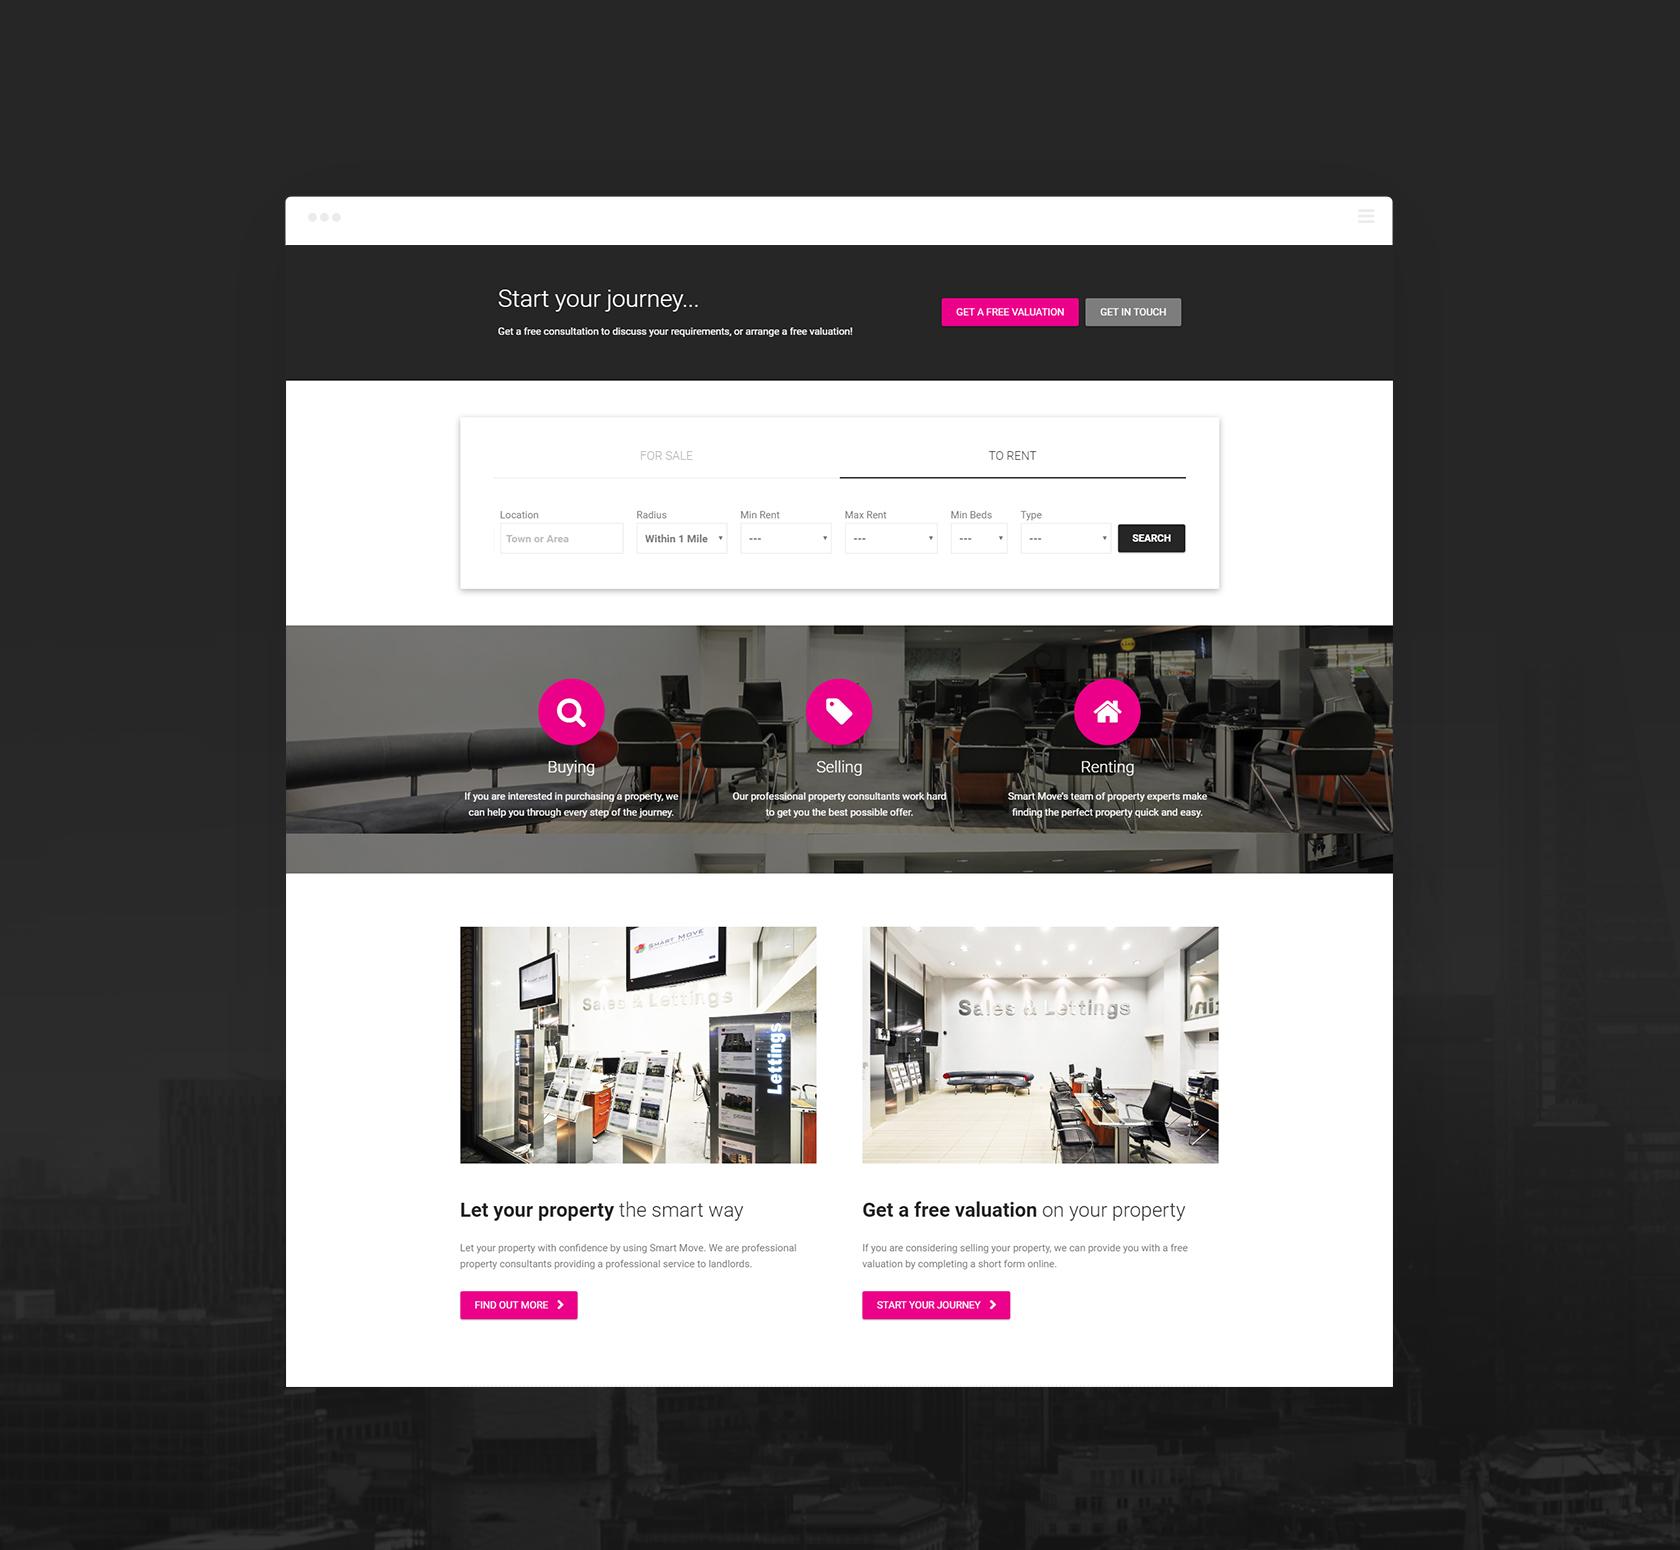 Smart Move Homepage - Smart Move (website) - Creative Digital